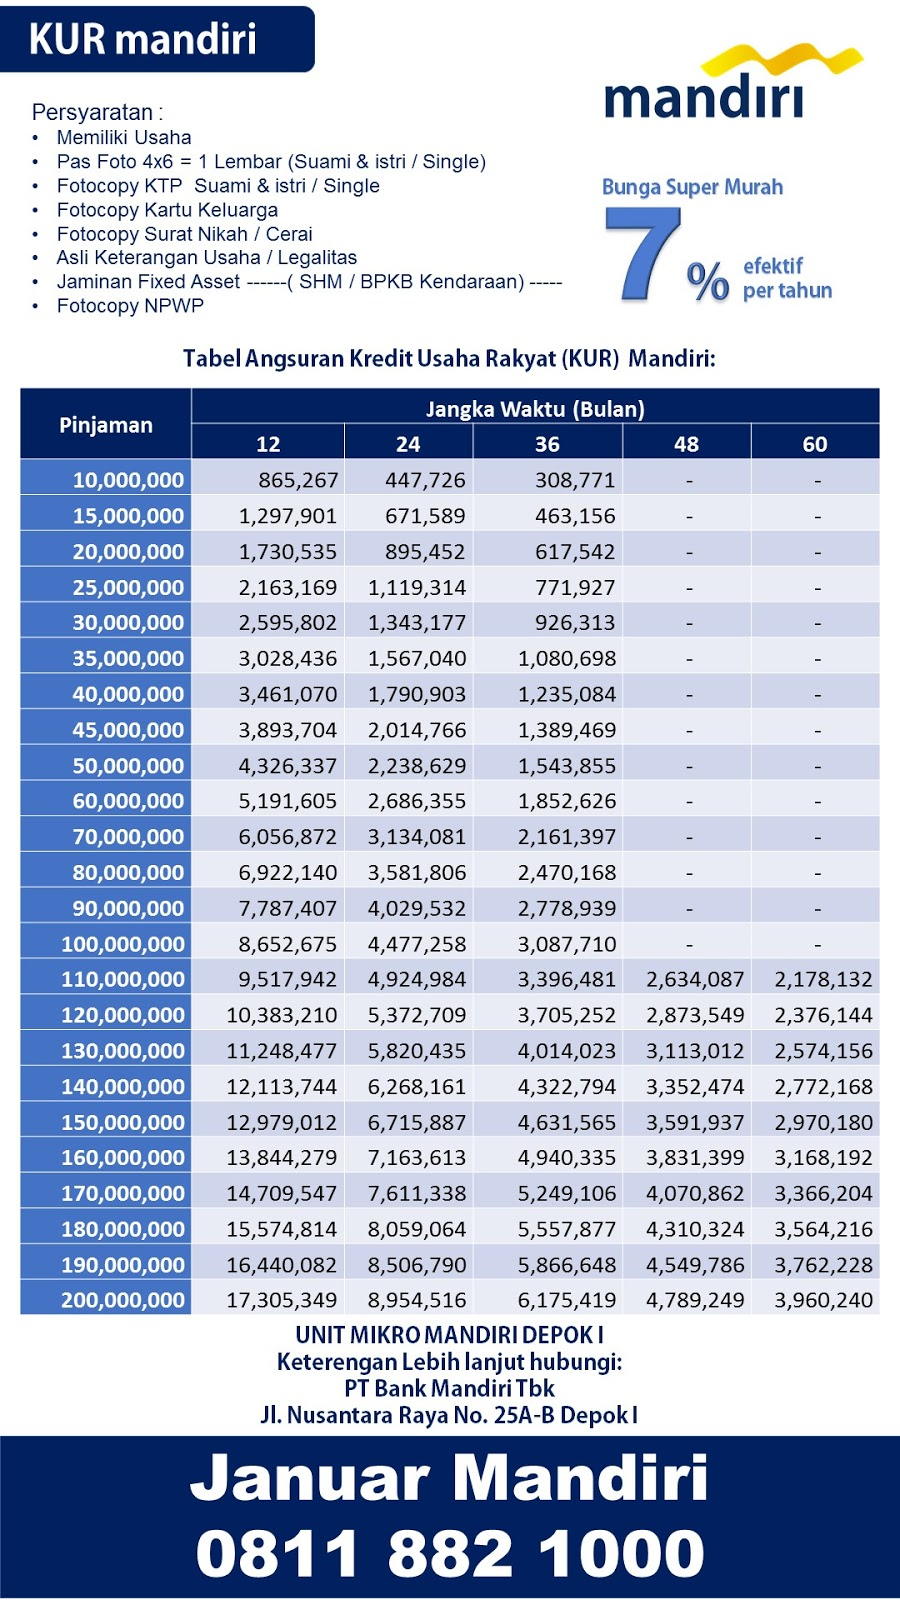 Tabel Angsuran Kredit Usaha Rakyat Kur Bank Mandiri Pinjaman Bank Mandiri Depok